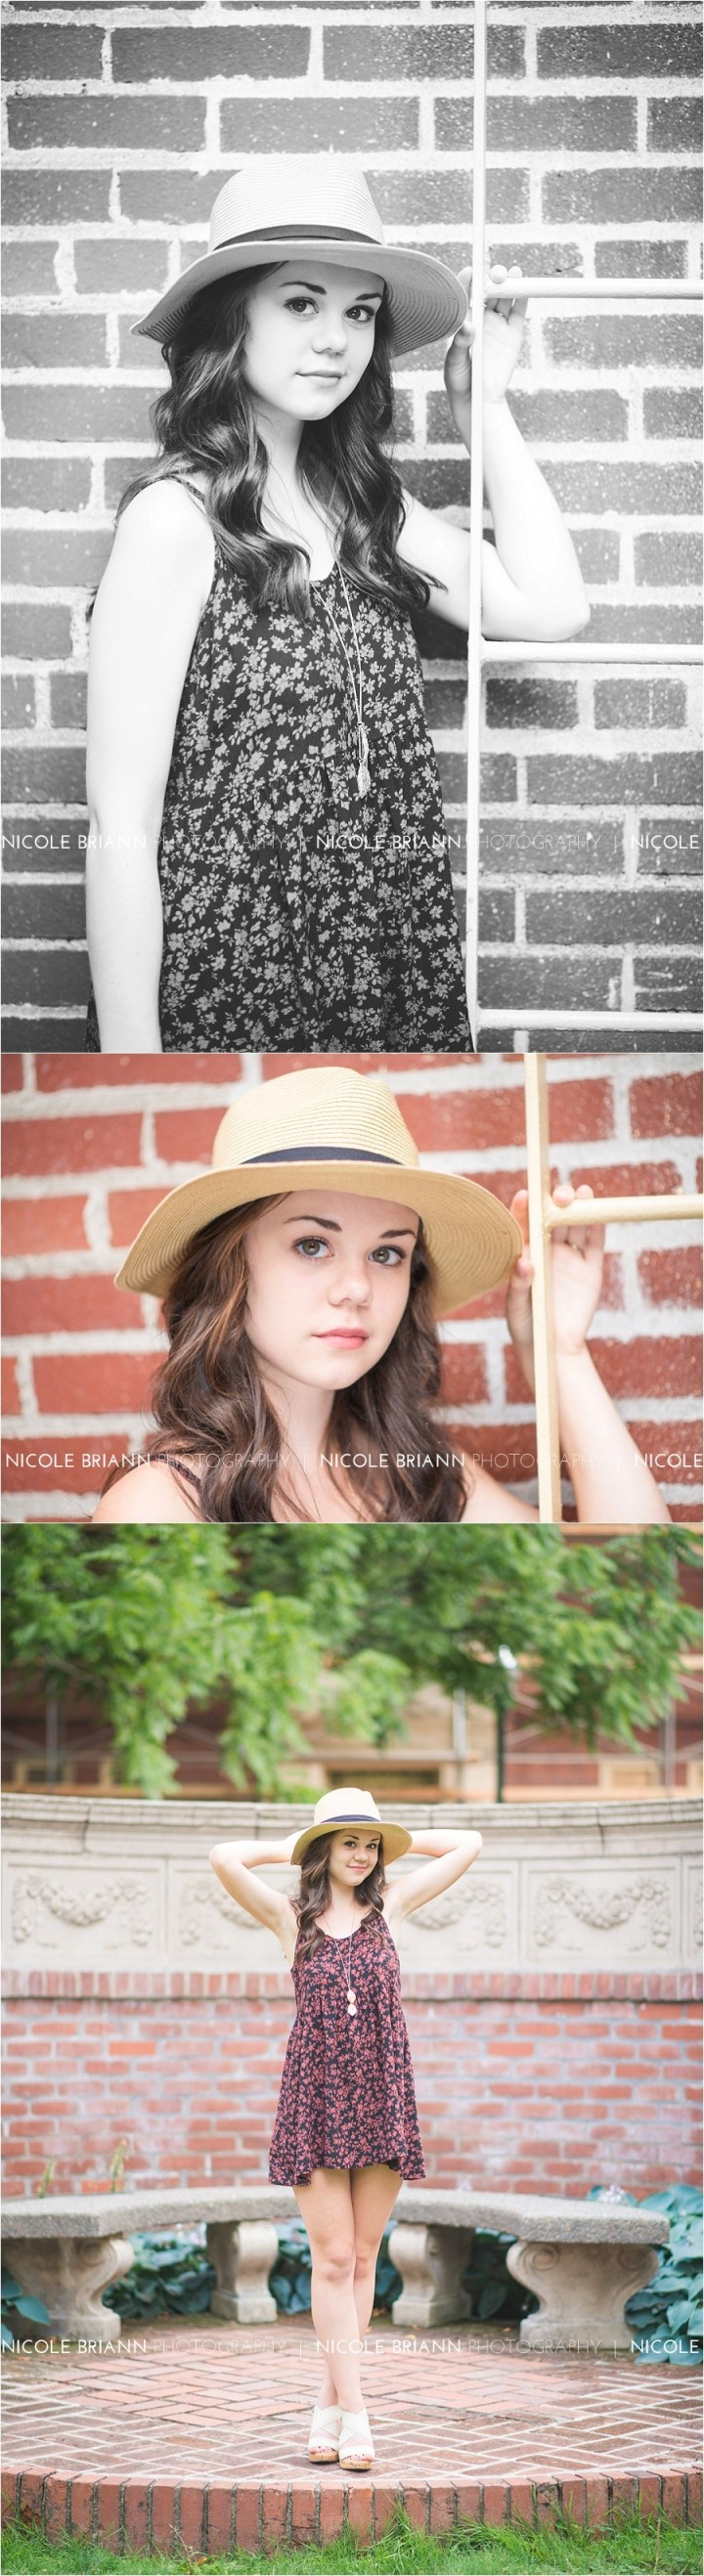 sweet-home-oregon-senior-portrait-photographer-nicole-briann-photography-maria_0005